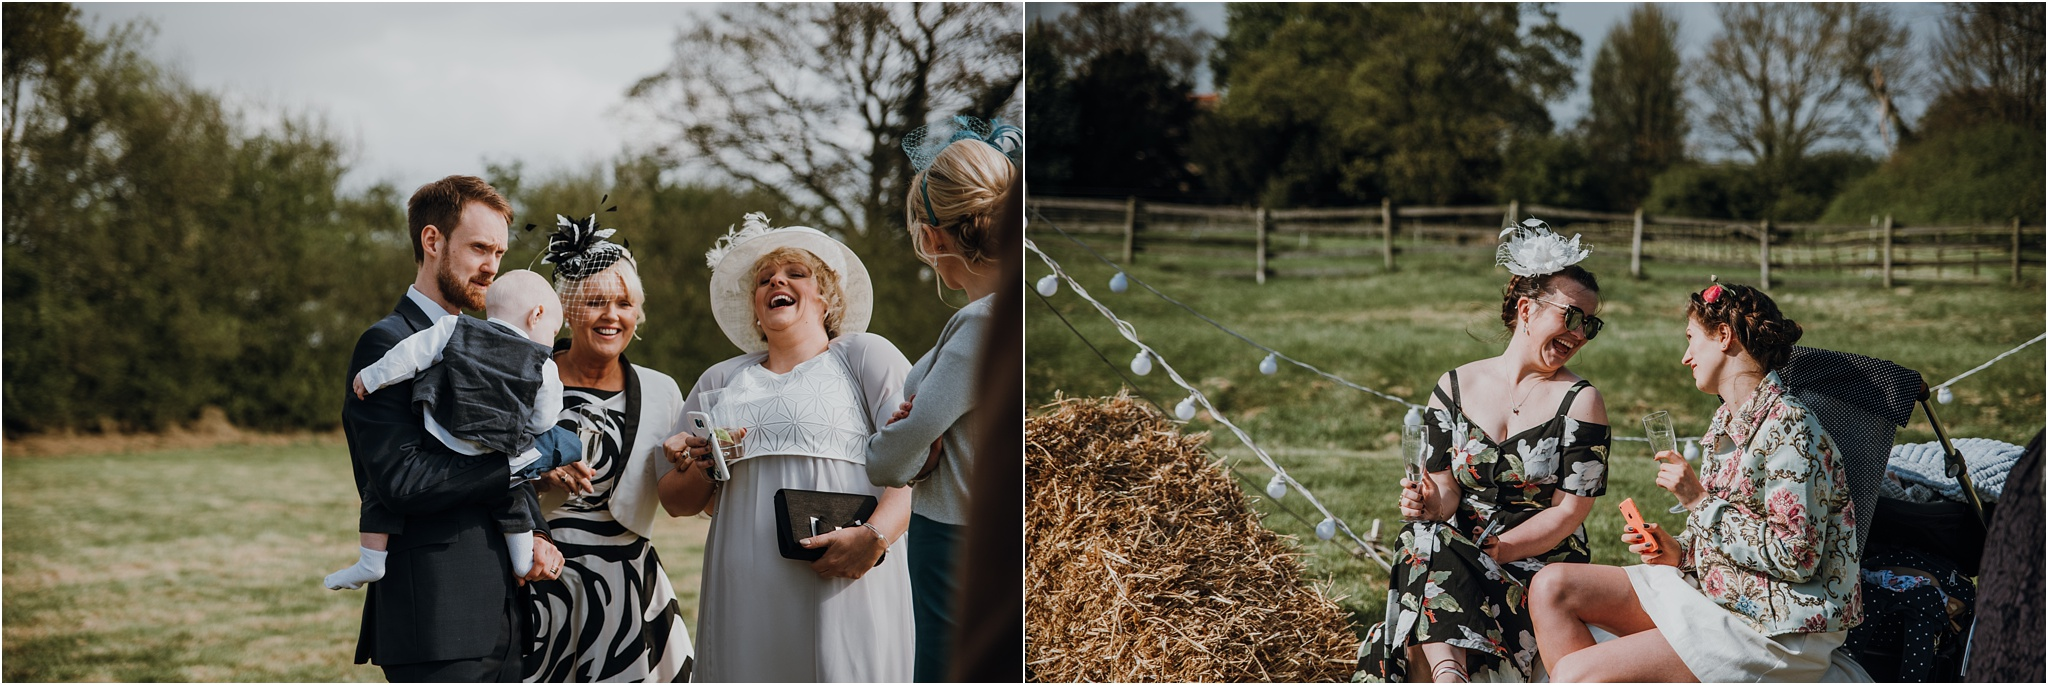 Outdoor-country-wedding-Edinburgh-photographer__0094.jpg